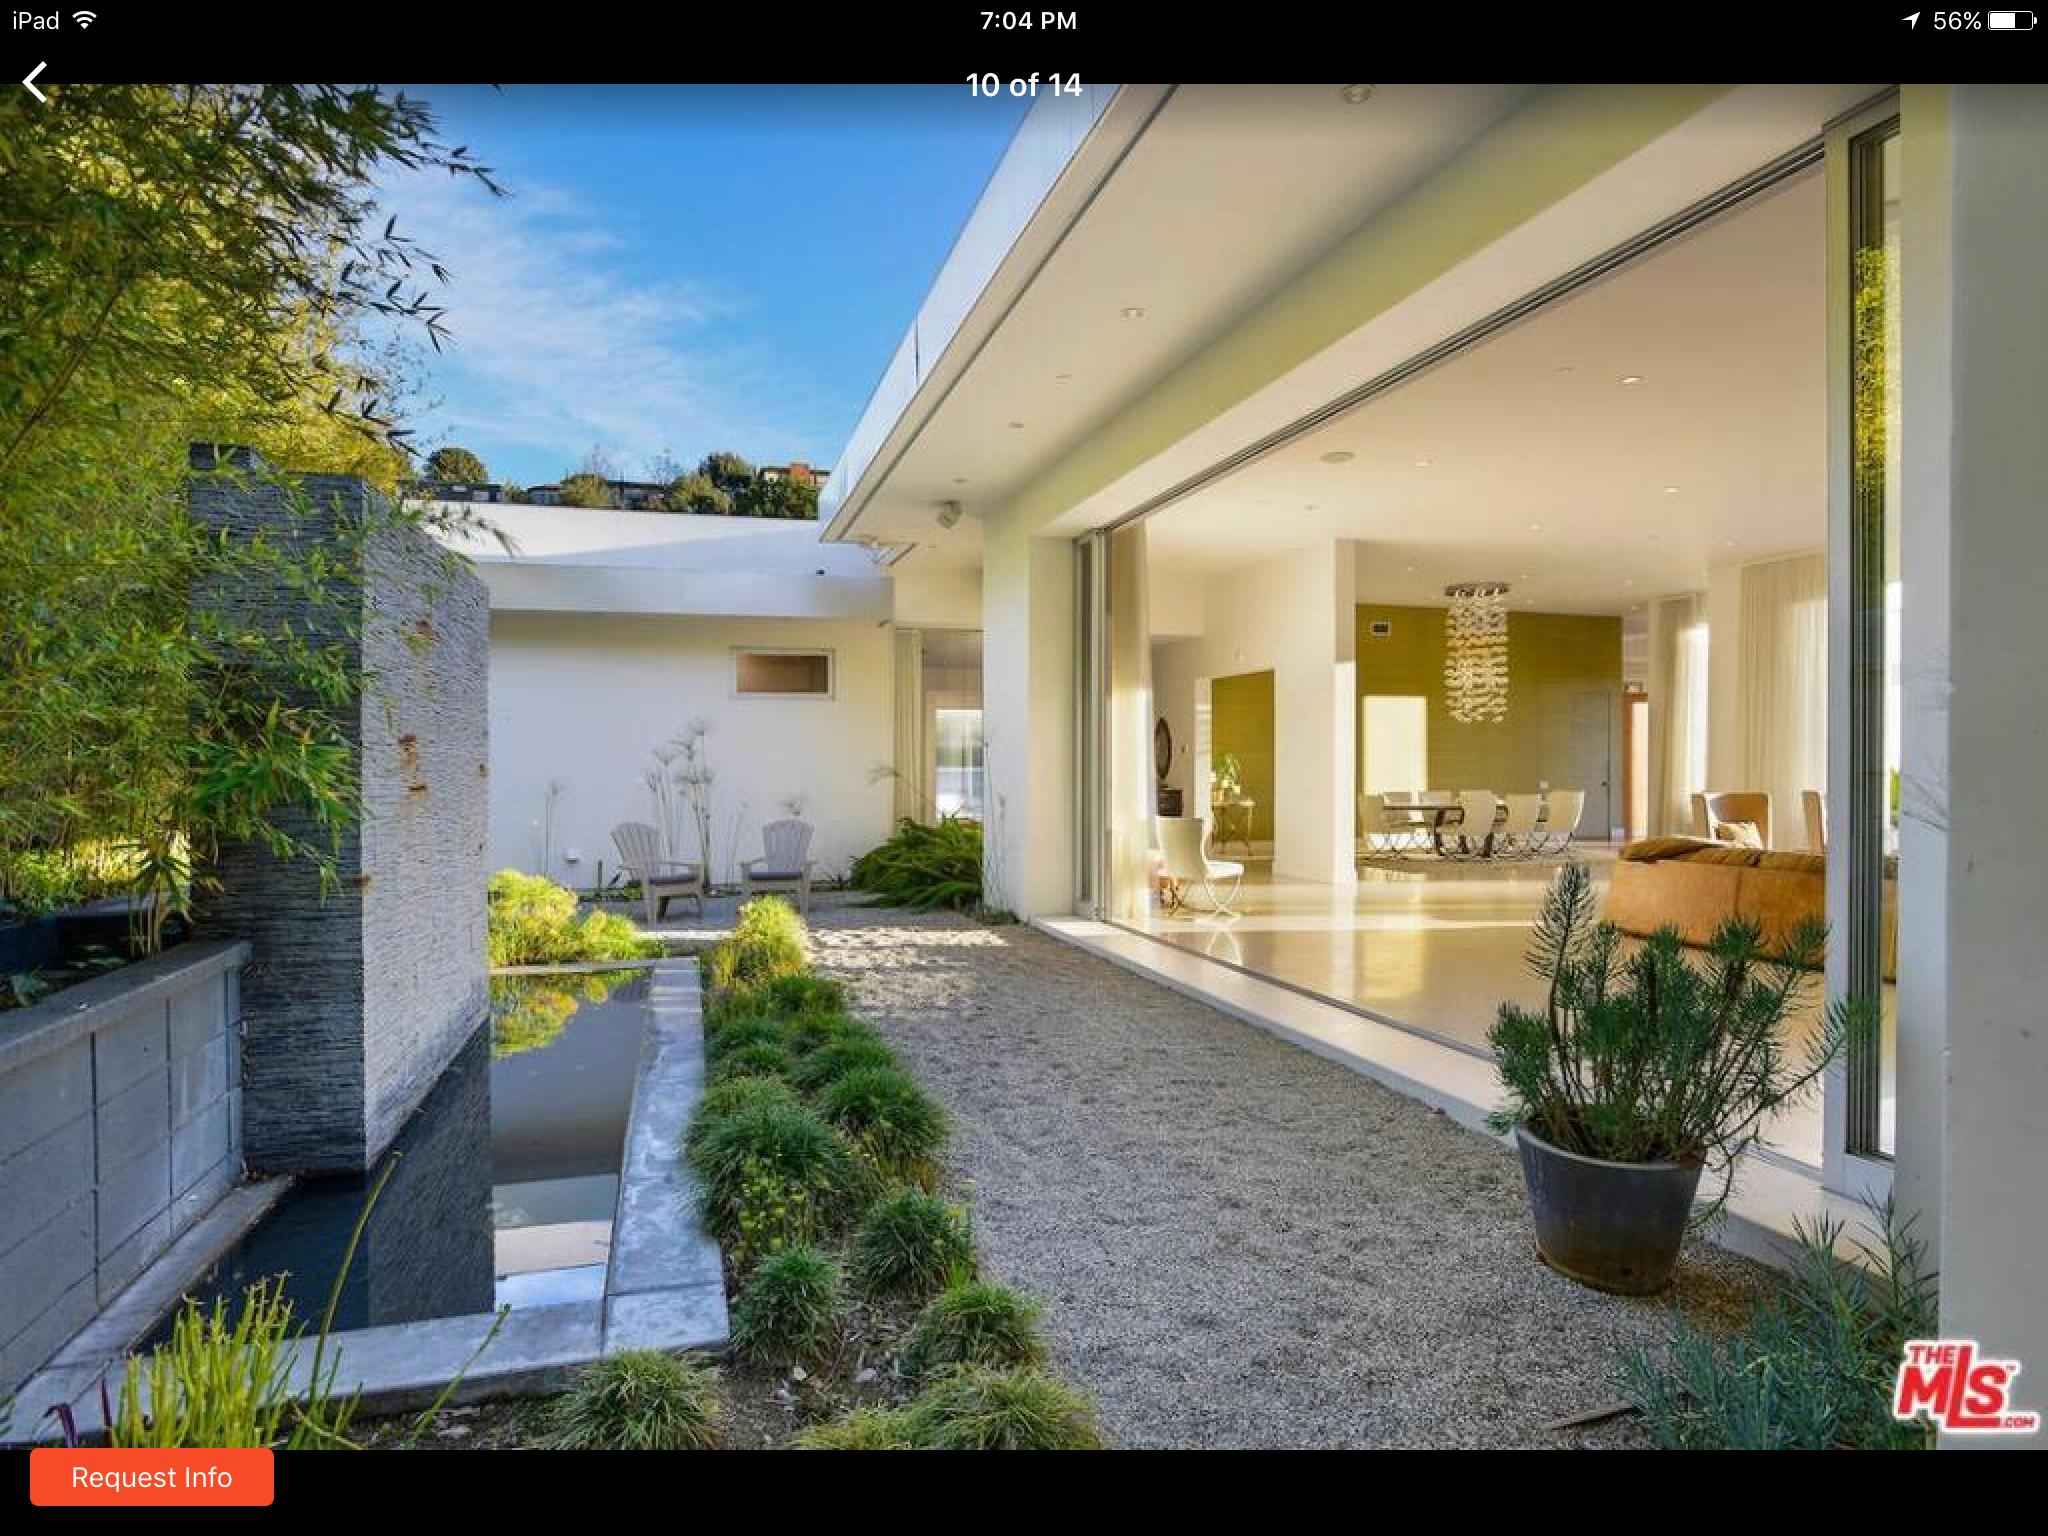 Landscaping, California, Patios, Yard Landscaping, Garden Design,  Landscape, Landscaping Ideas